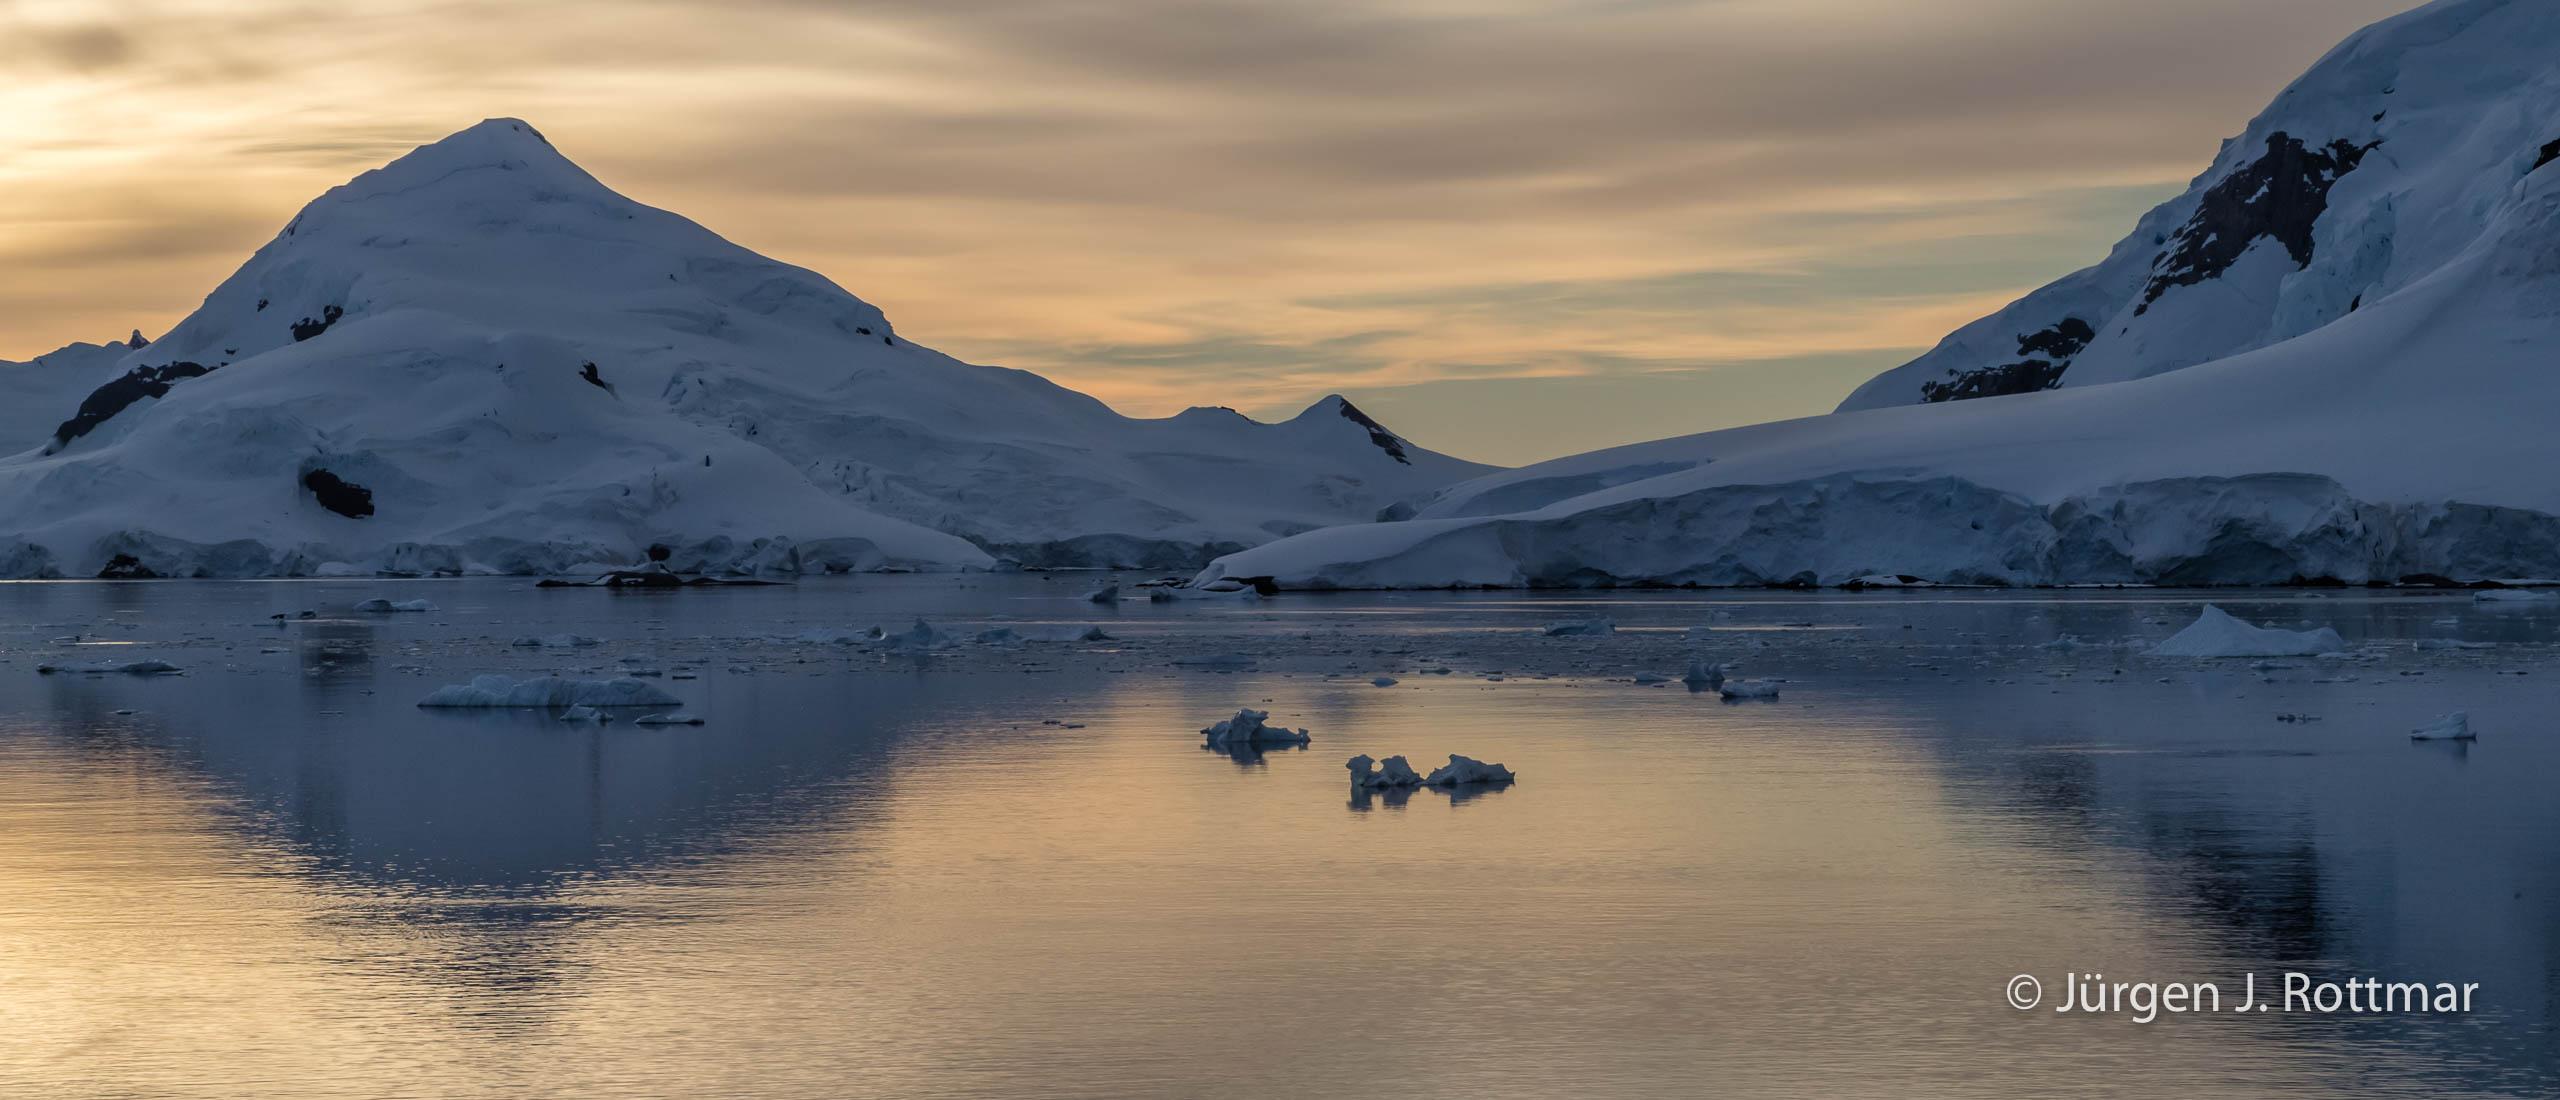 Juergen J Rottmar Antarctica M2I1183 Bearbeitet